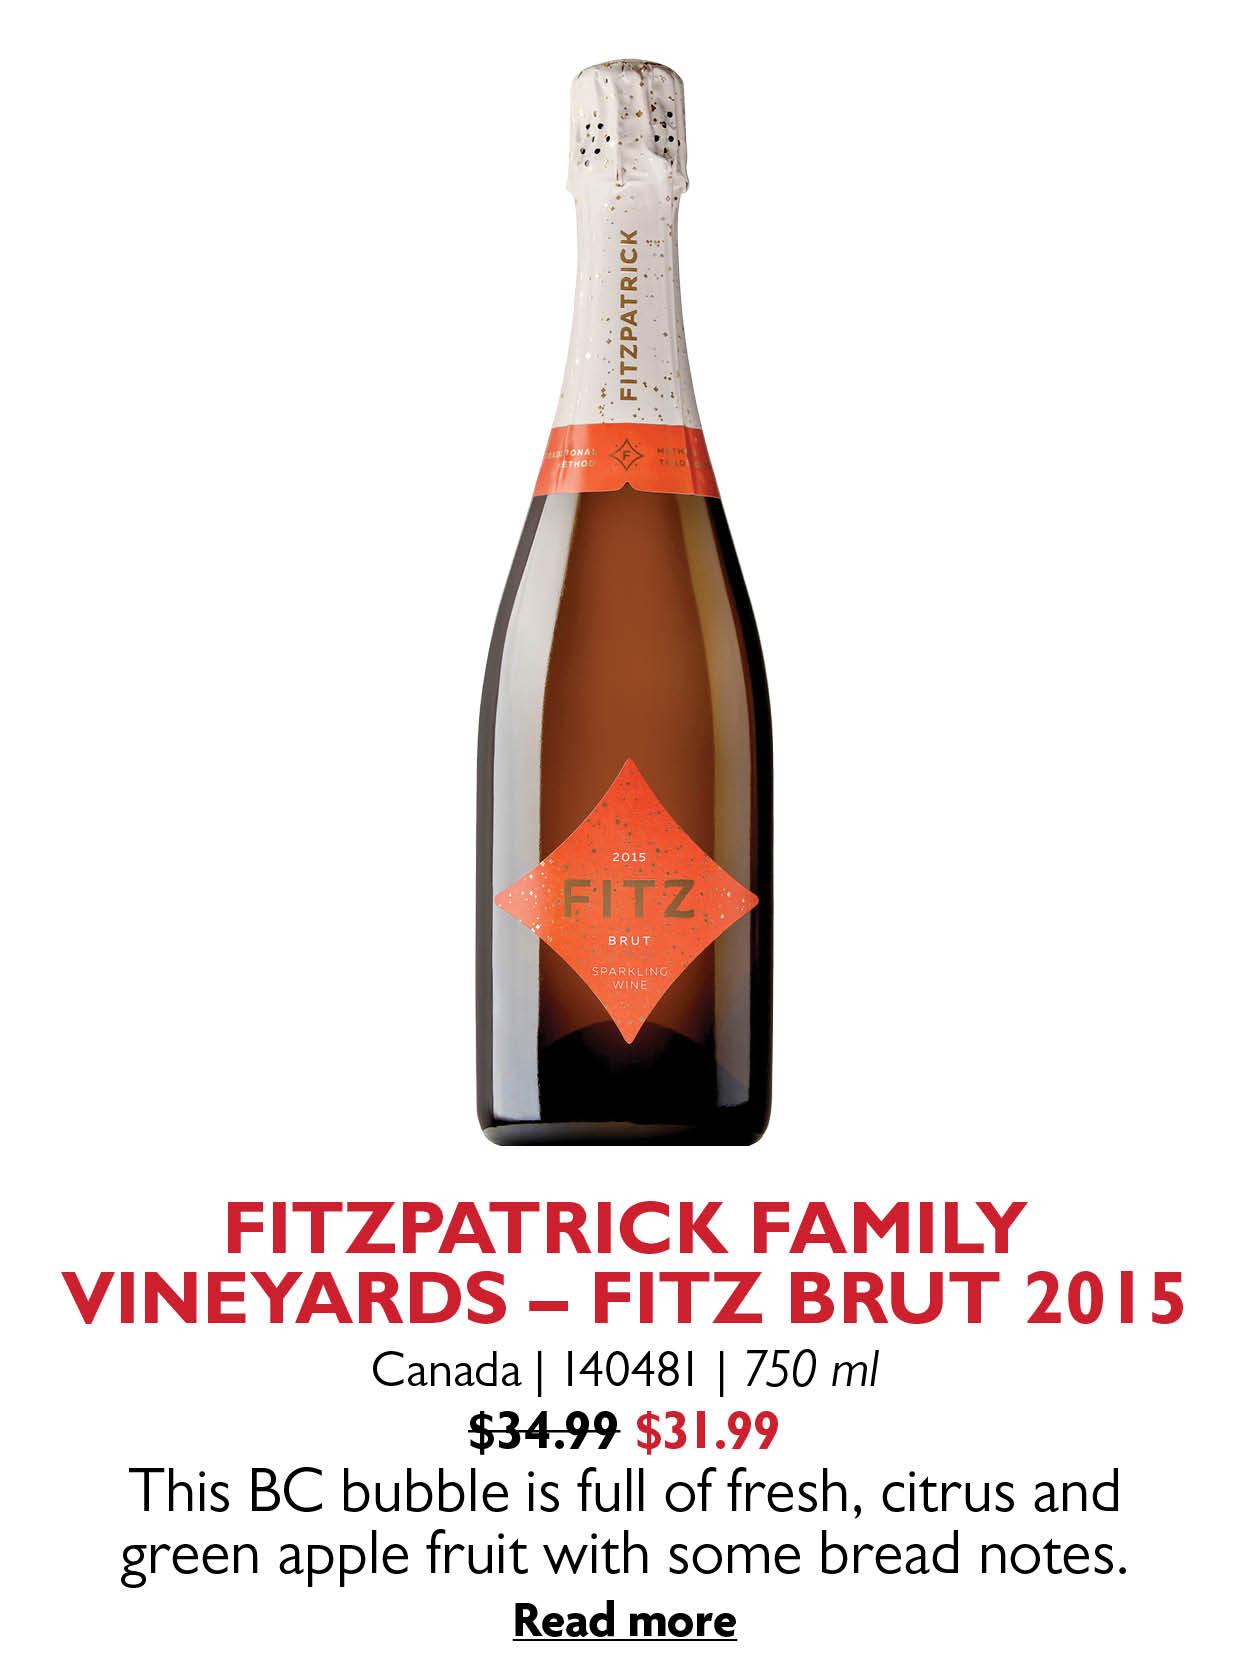 FITZPATRICK FAMILY VINEYARDS - FITZ BRUT 2015